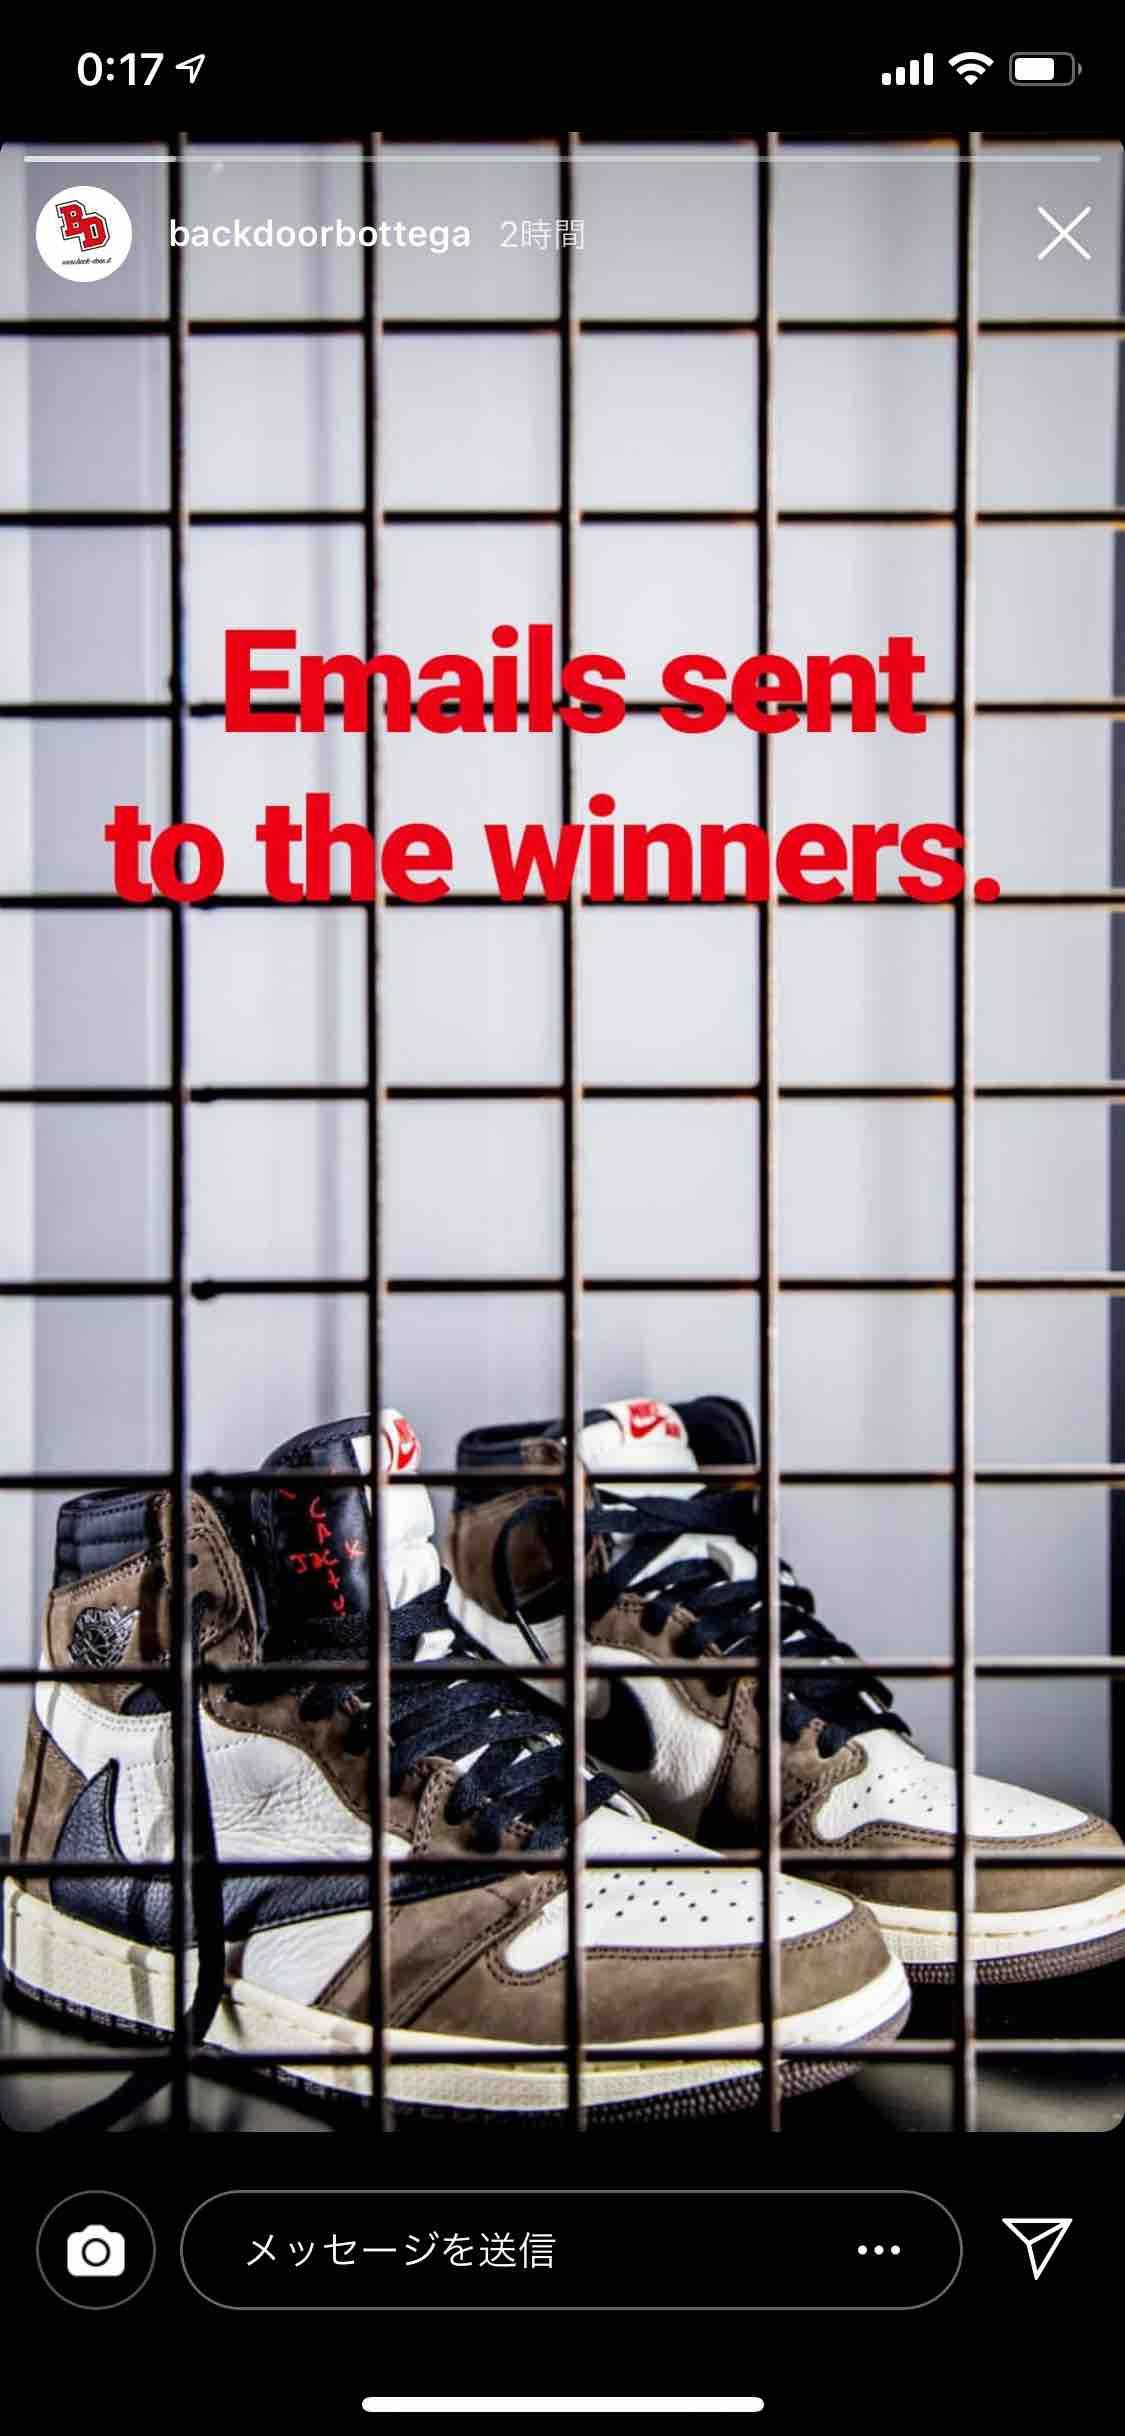 OBD 当選者にはメール配信されてるようですよ。 文面からいくと落選した方は来